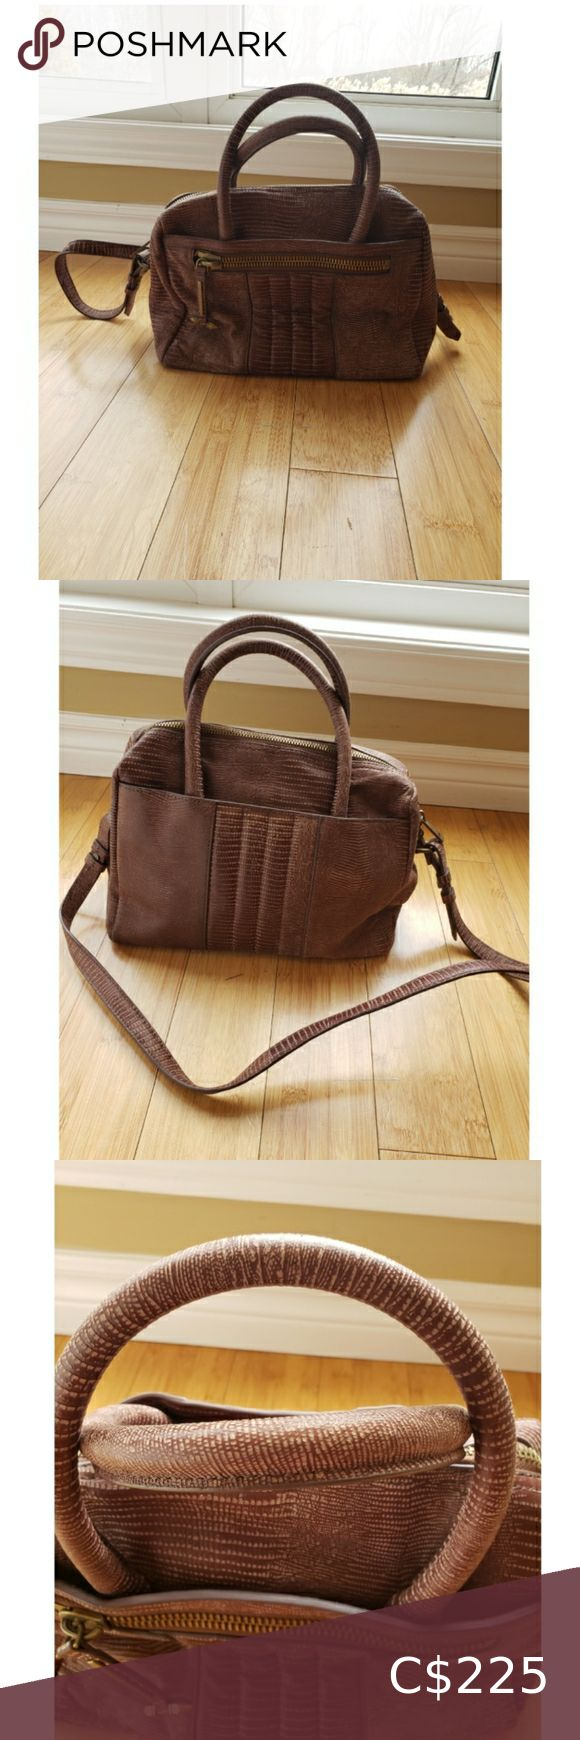 Michael Kors Grey Leather Bag   Grey leather bags